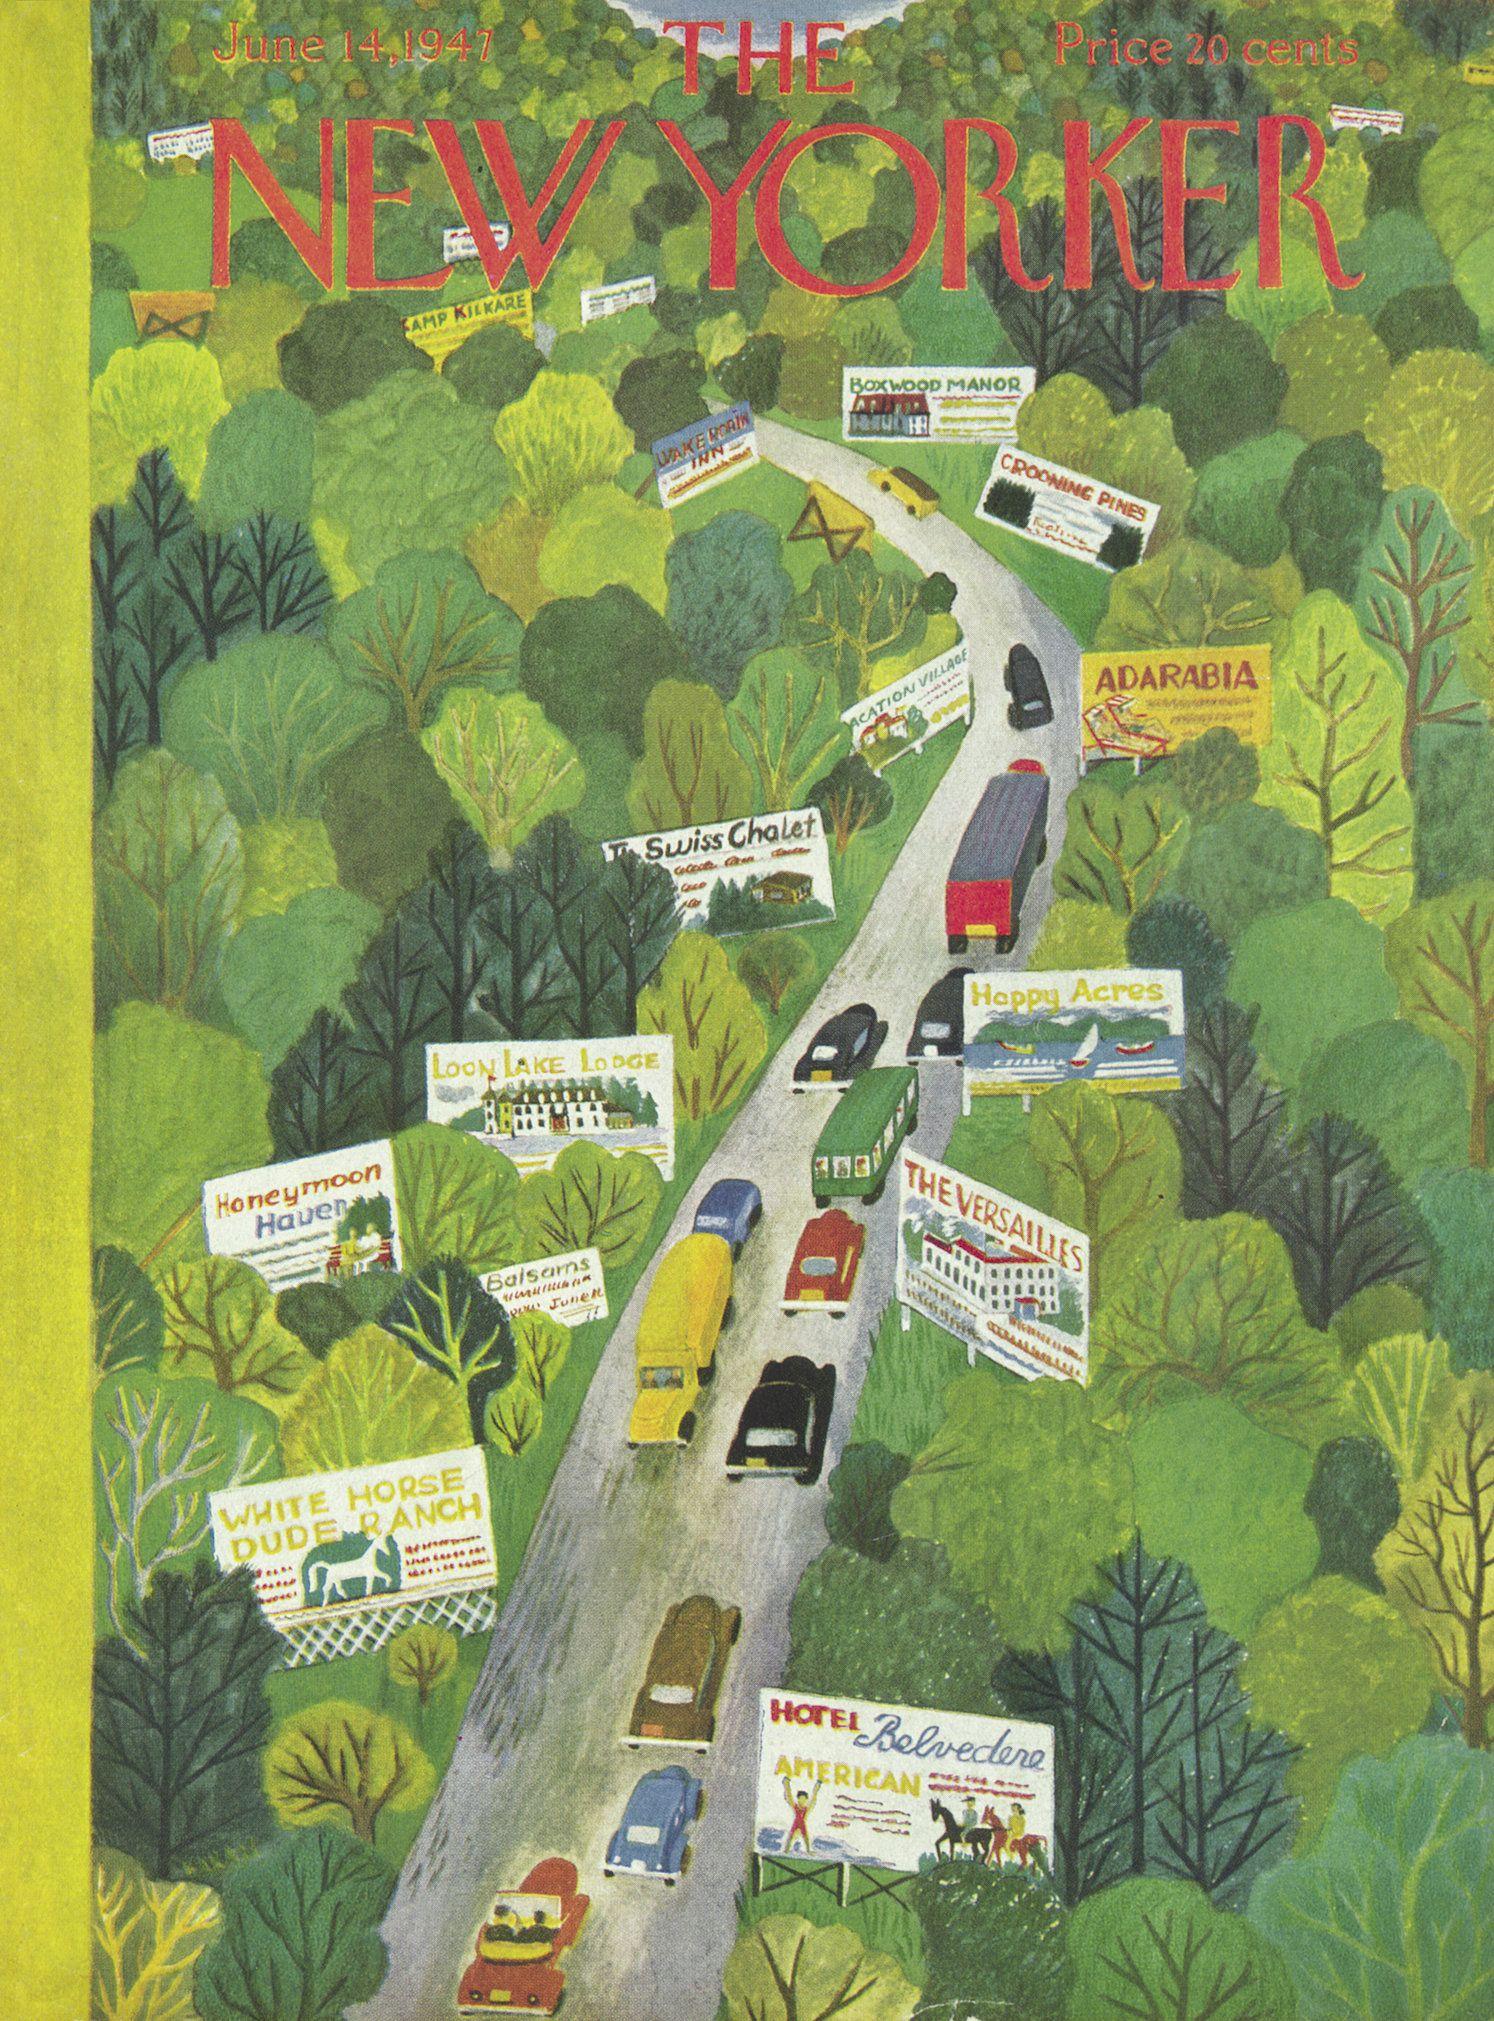 The New Yorker - Saturday, June 14, 1947 - Issue # 1165 - Vol. 23 - N° 17 - Cover by : Ilonka Karasz